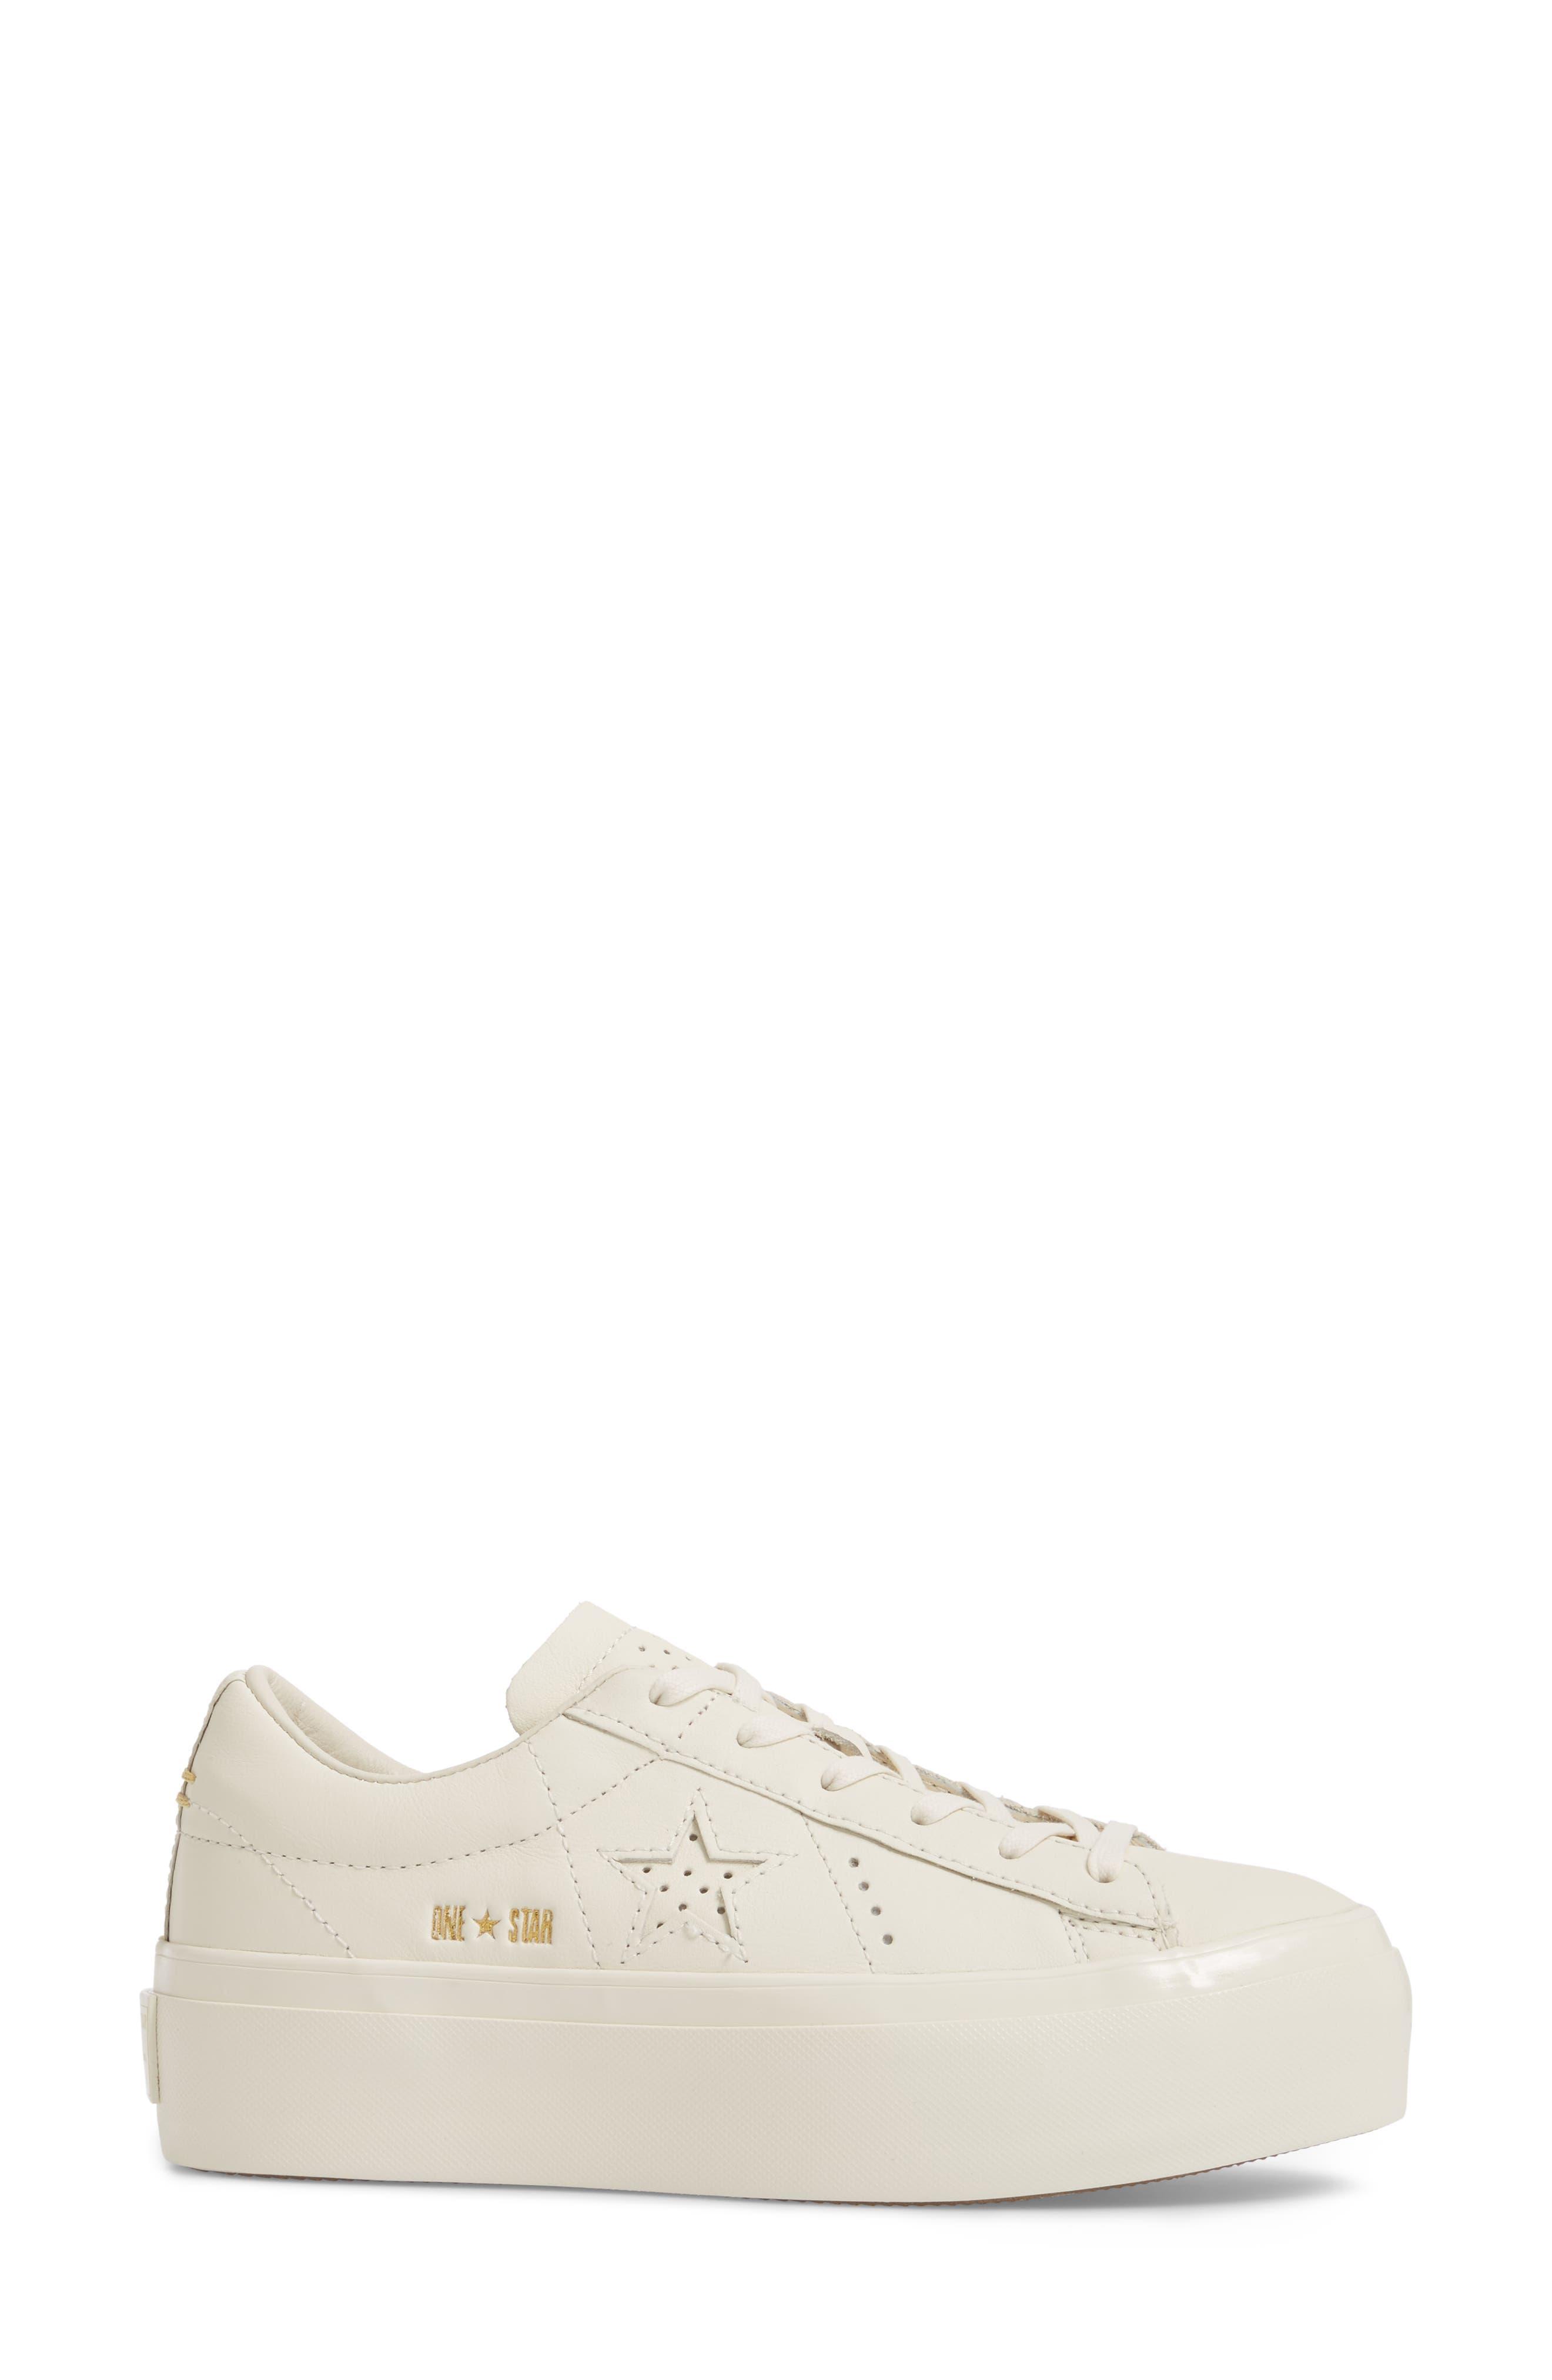 Chuck Taylor<sup>®</sup> All Star<sup>®</sup> One Star Platform Sneaker,                             Alternate thumbnail 3, color,                             Egret/ Egret